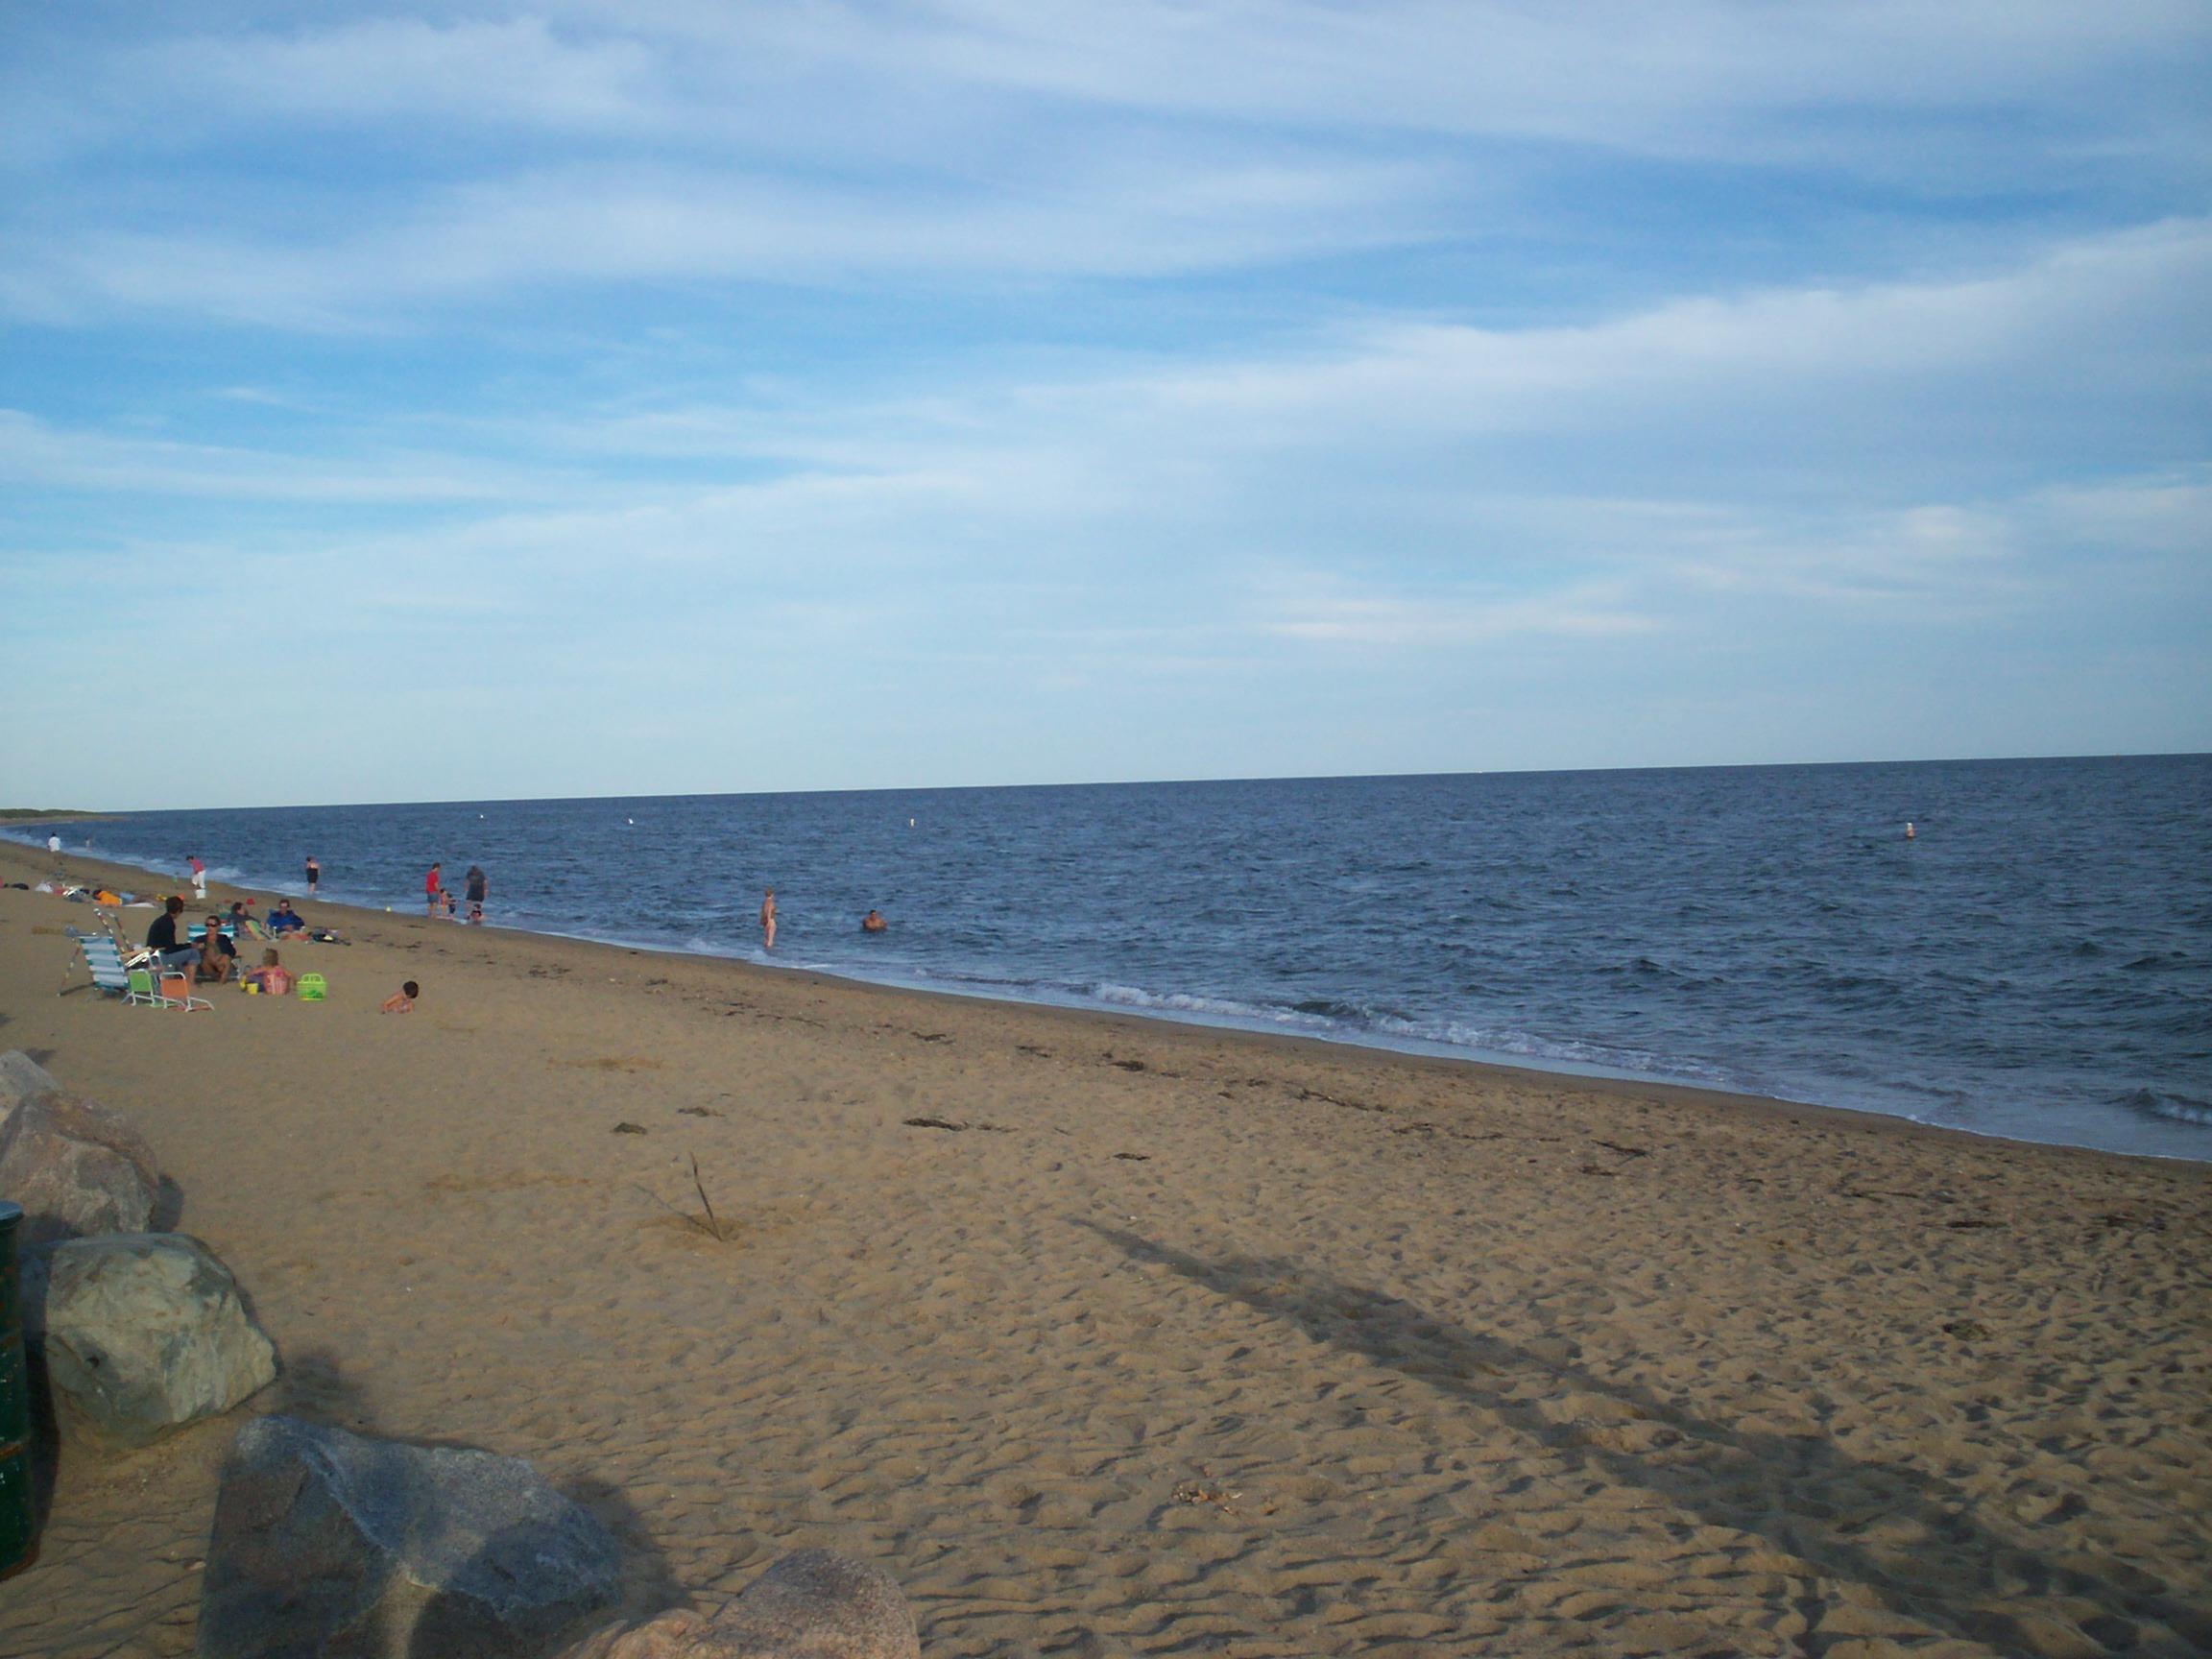 Cape Cod Summer House Rentals